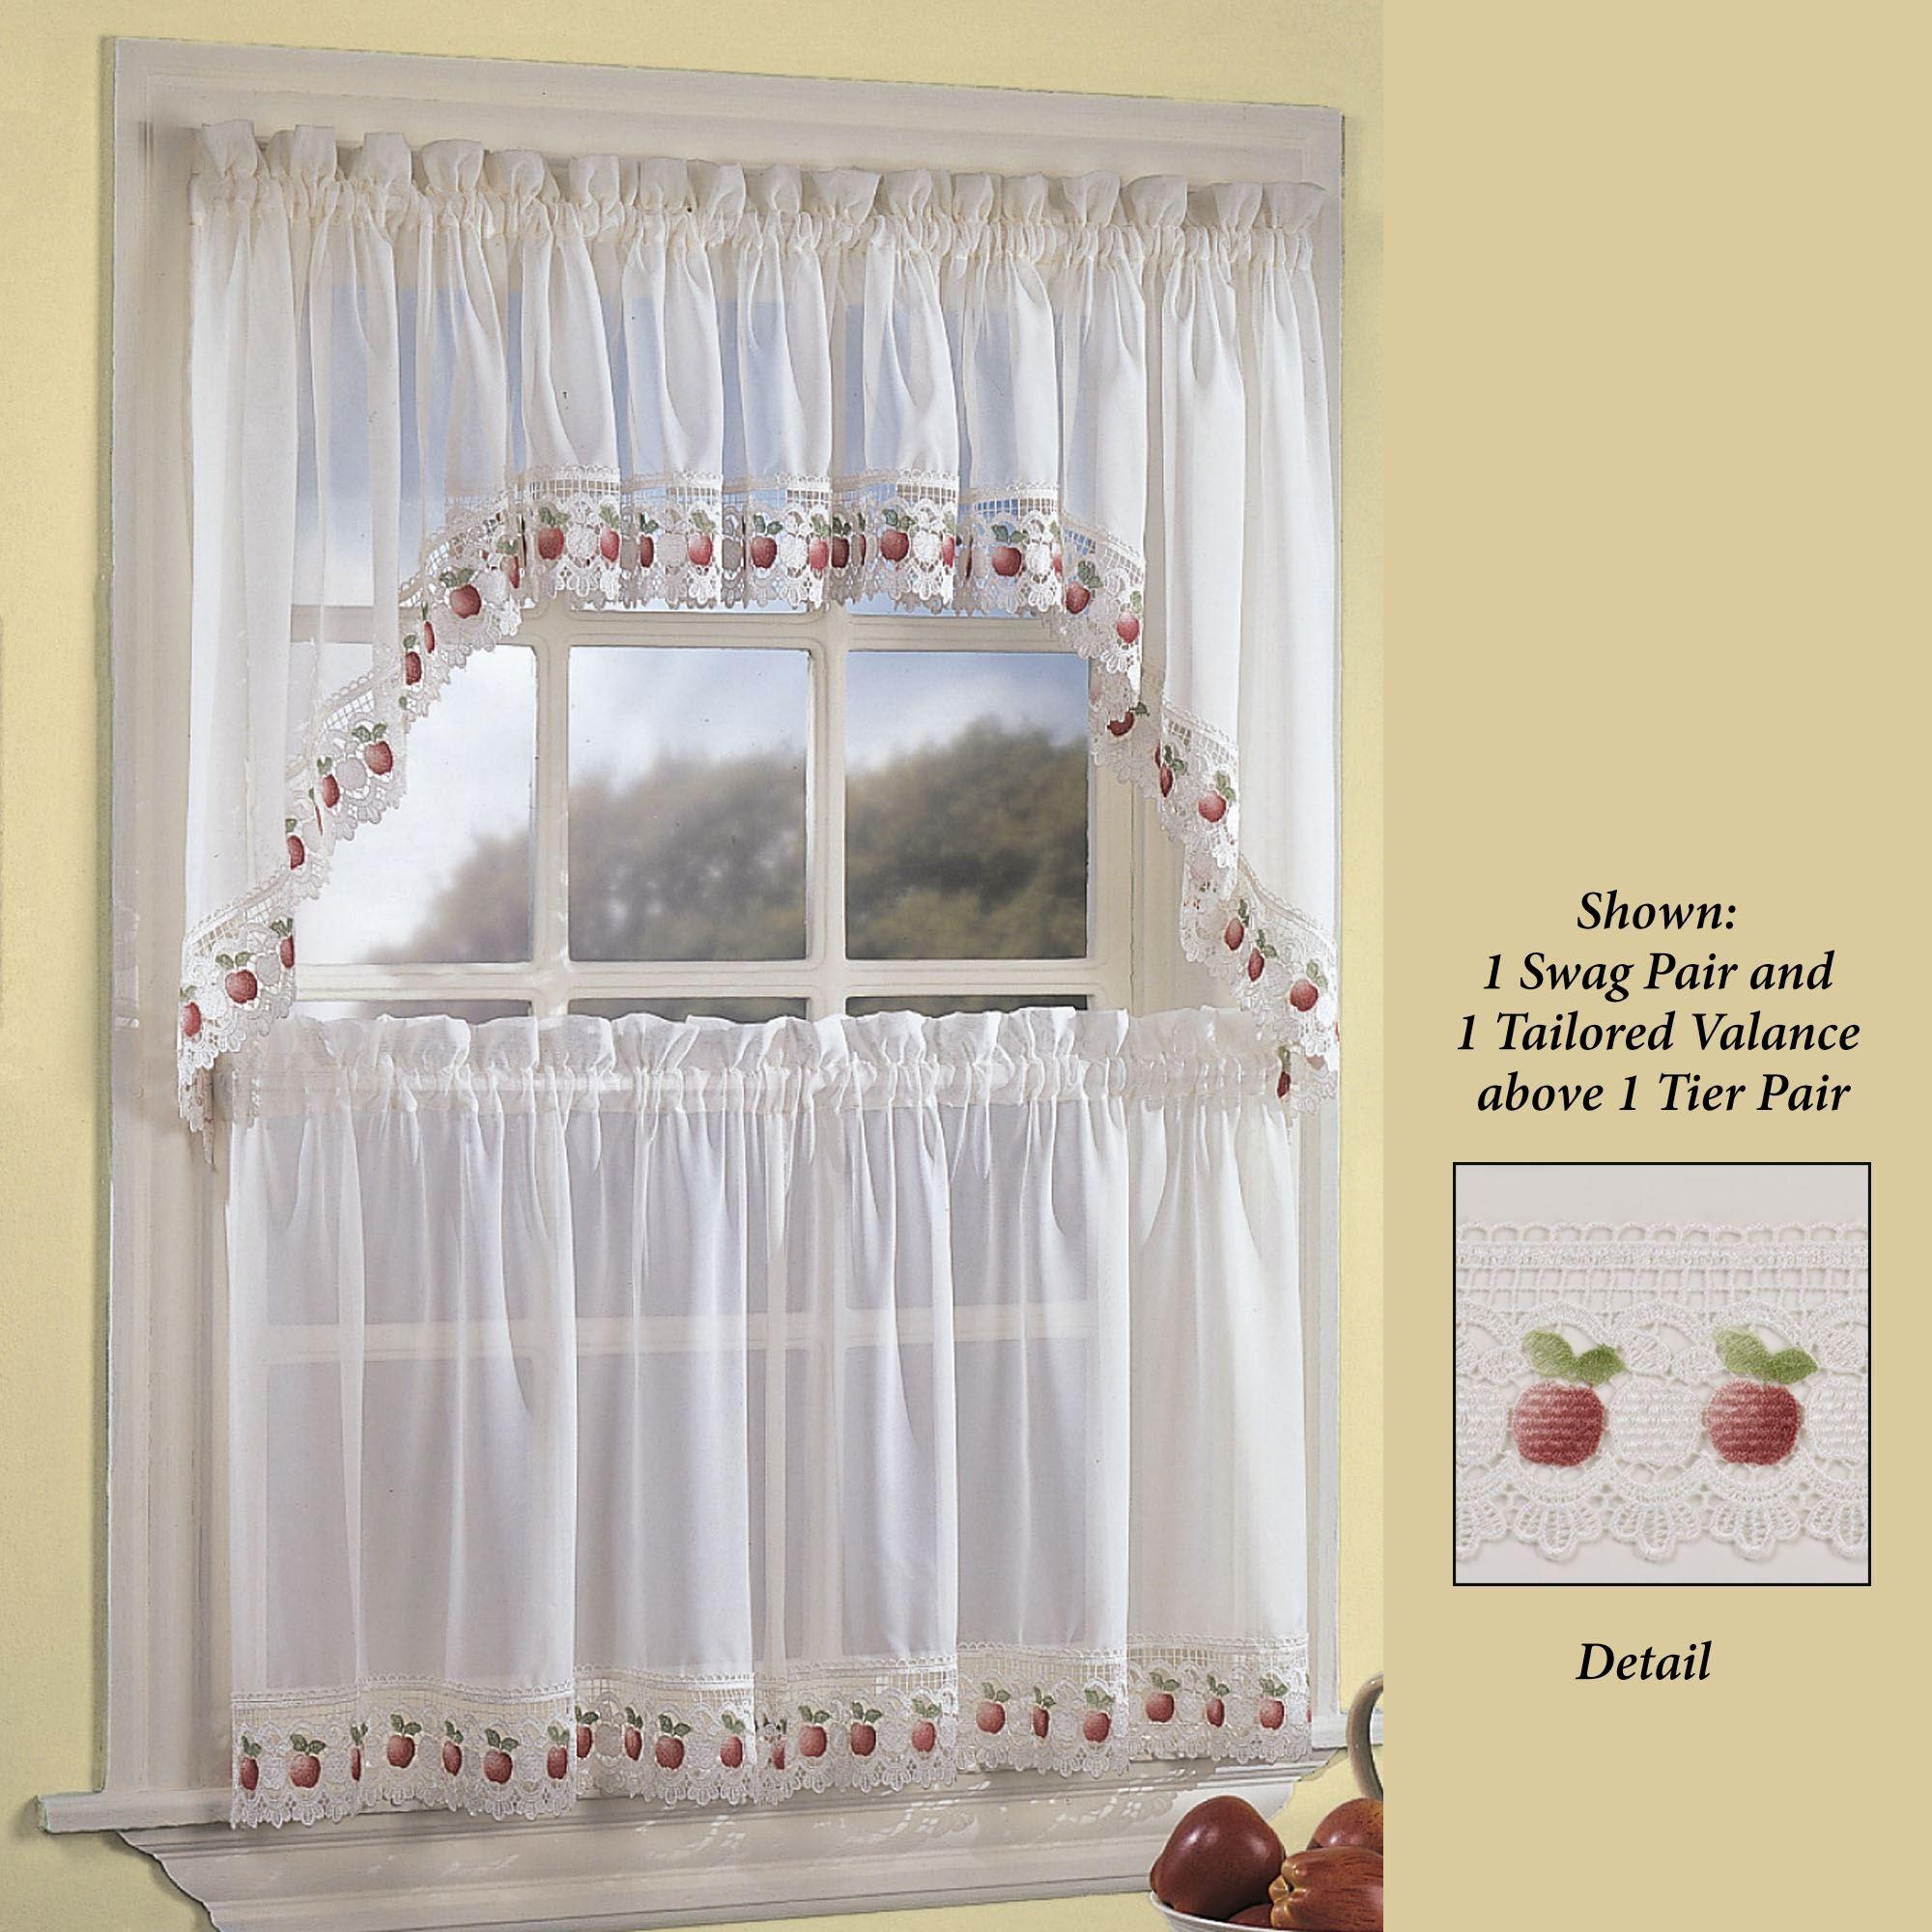 Groovy Apple Orchard Sheer Kitchen Tier Window Treatment Download Free Architecture Designs Scobabritishbridgeorg